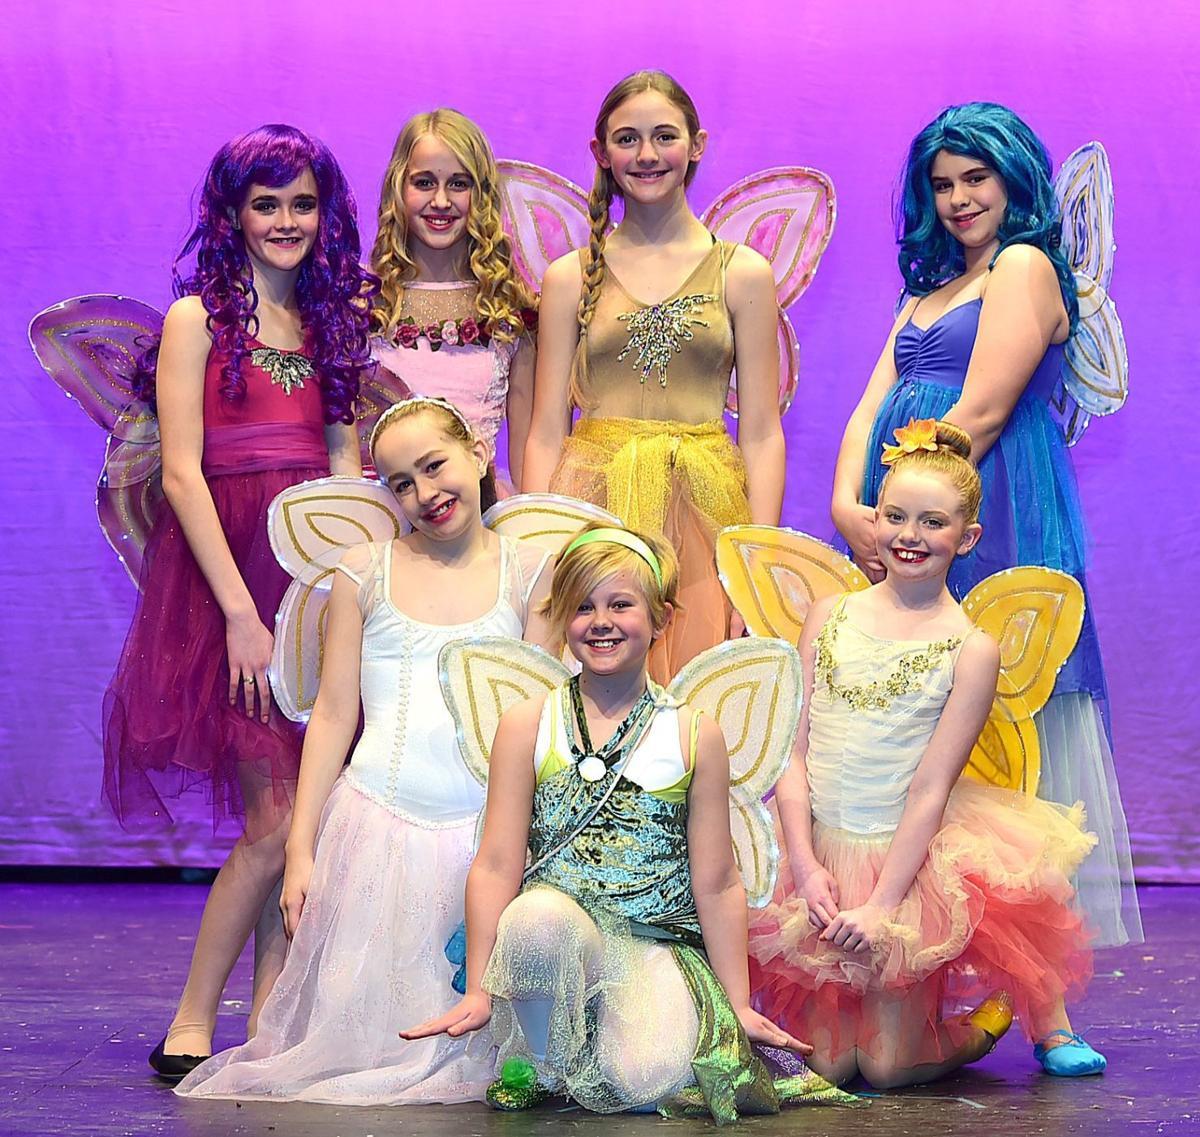 Peter Pan fairies